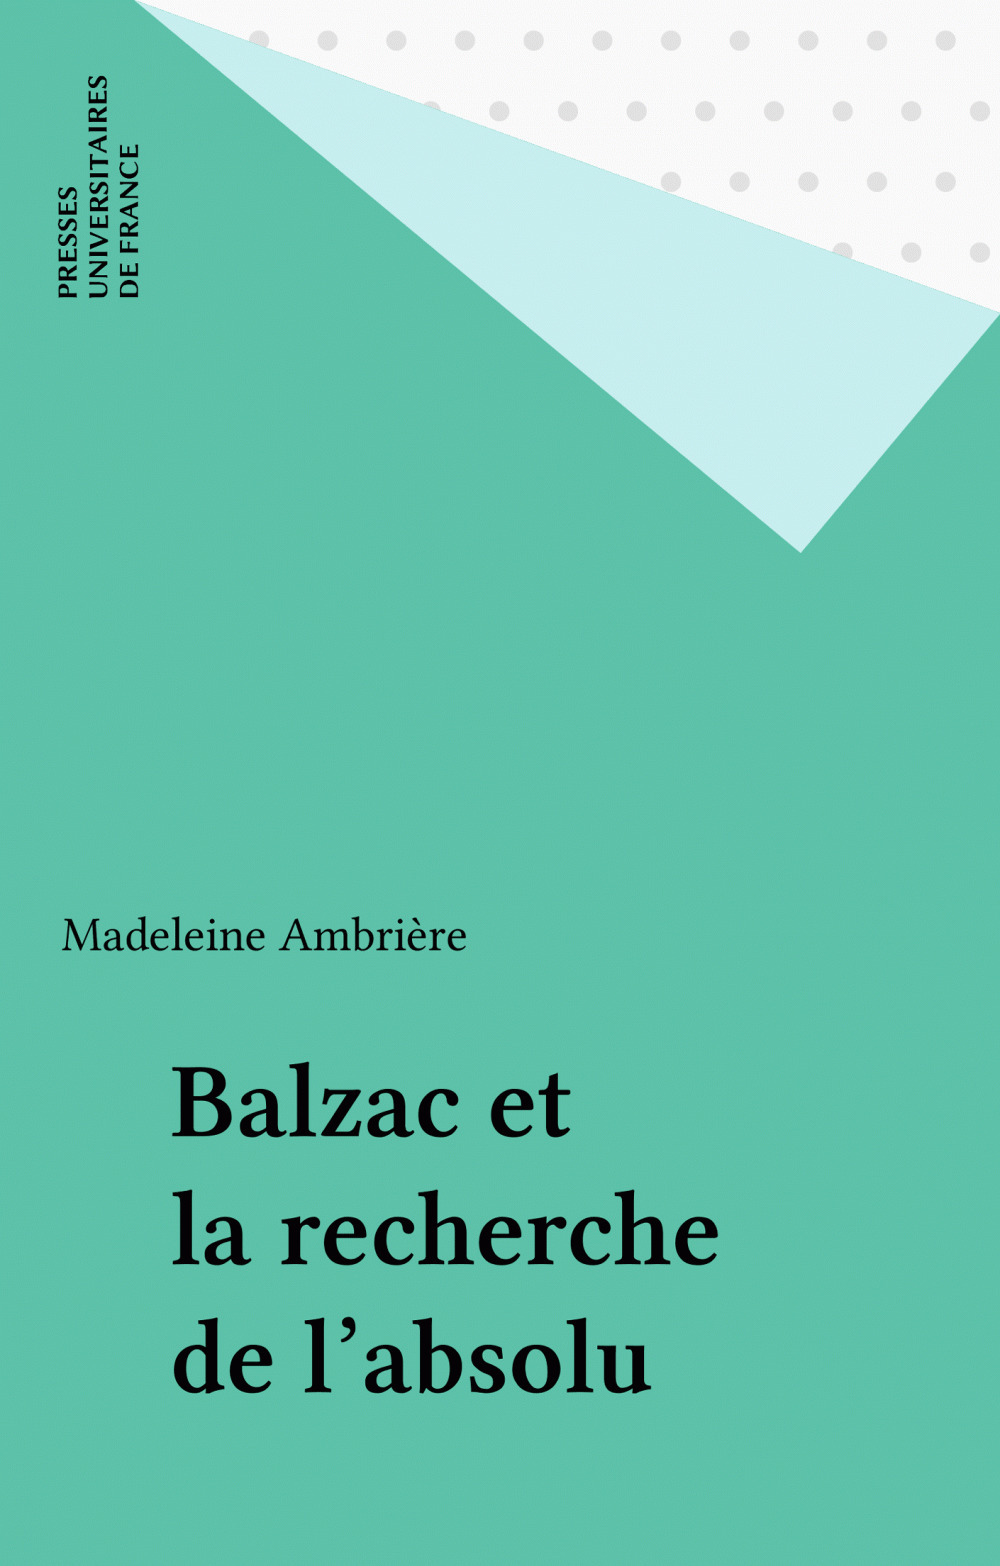 Balzac et la recherche de l'absolu